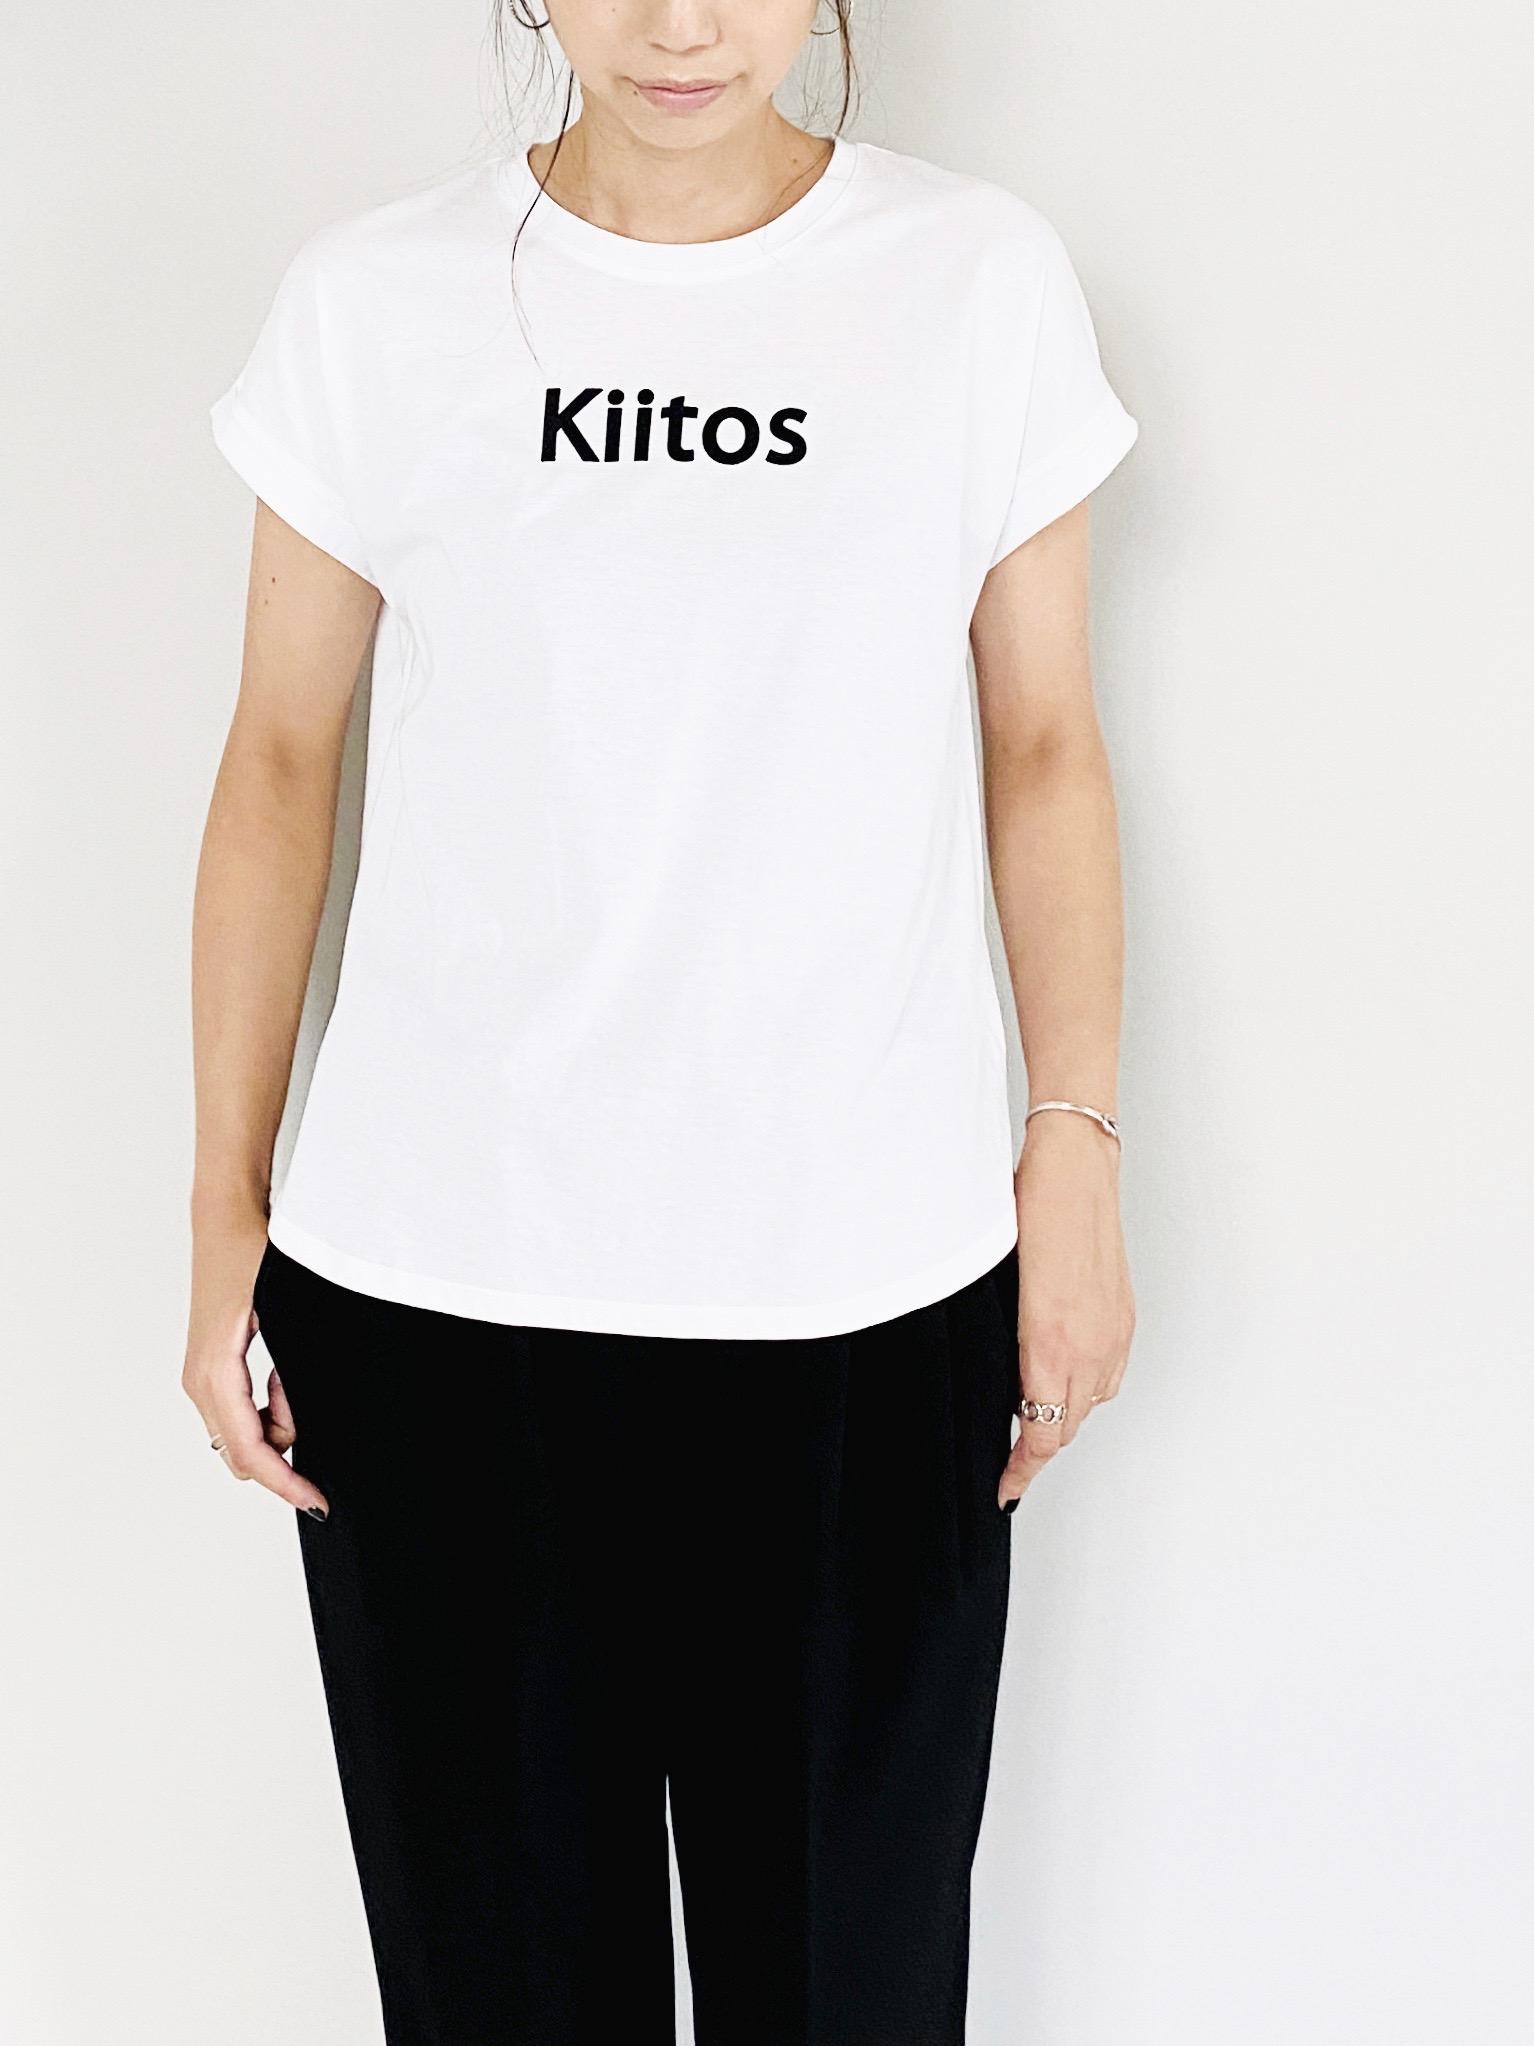 SELECT(セレクト)  Kiitos ロールアップT-SHIRT